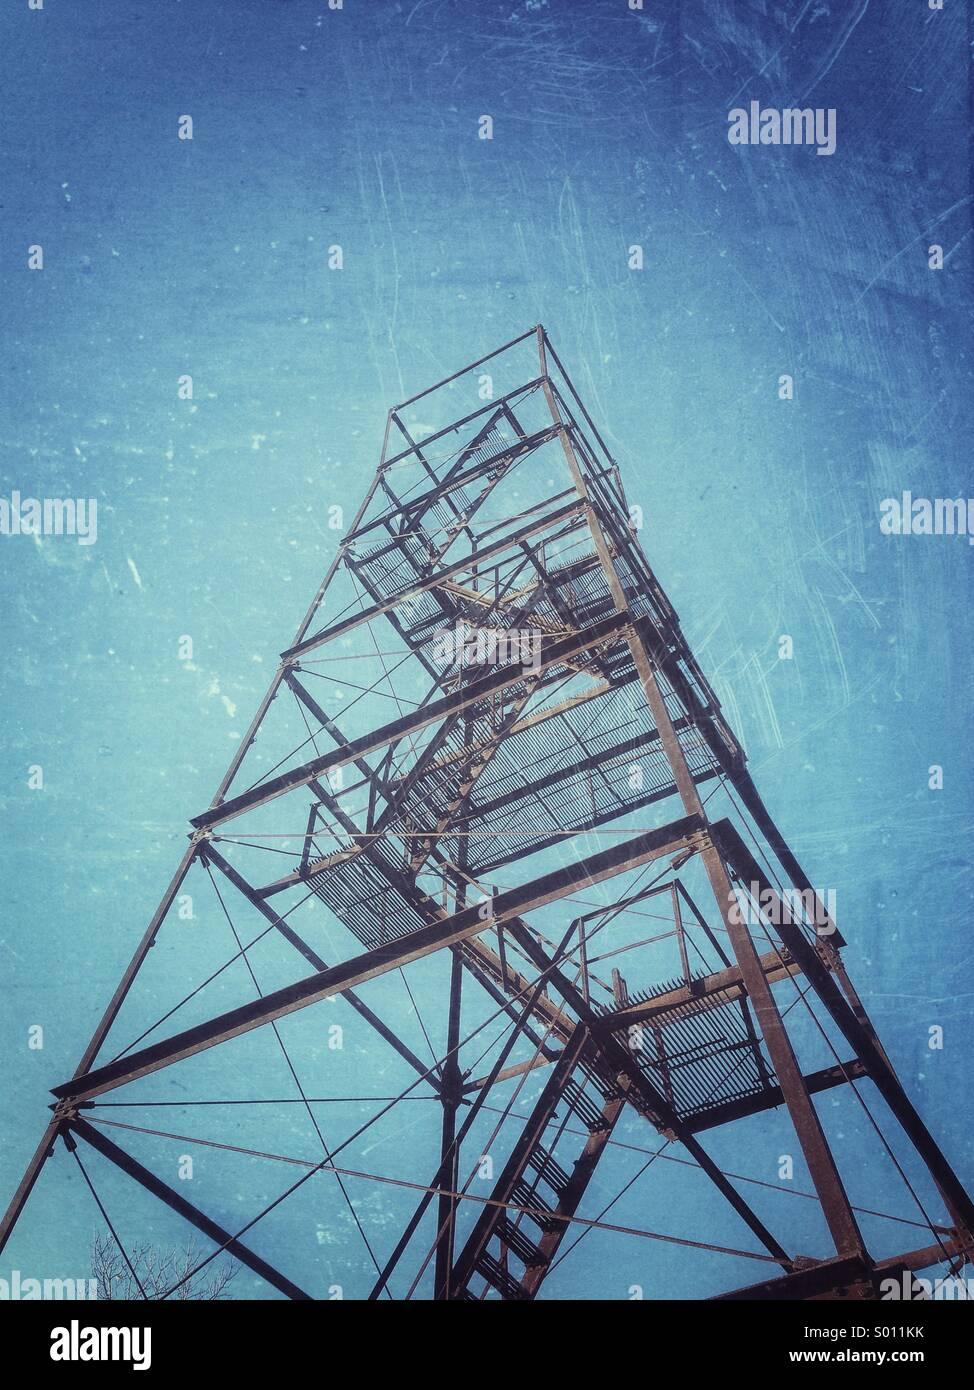 Abandoned fire tower in Lynn, Massachusetts. - Stock Image